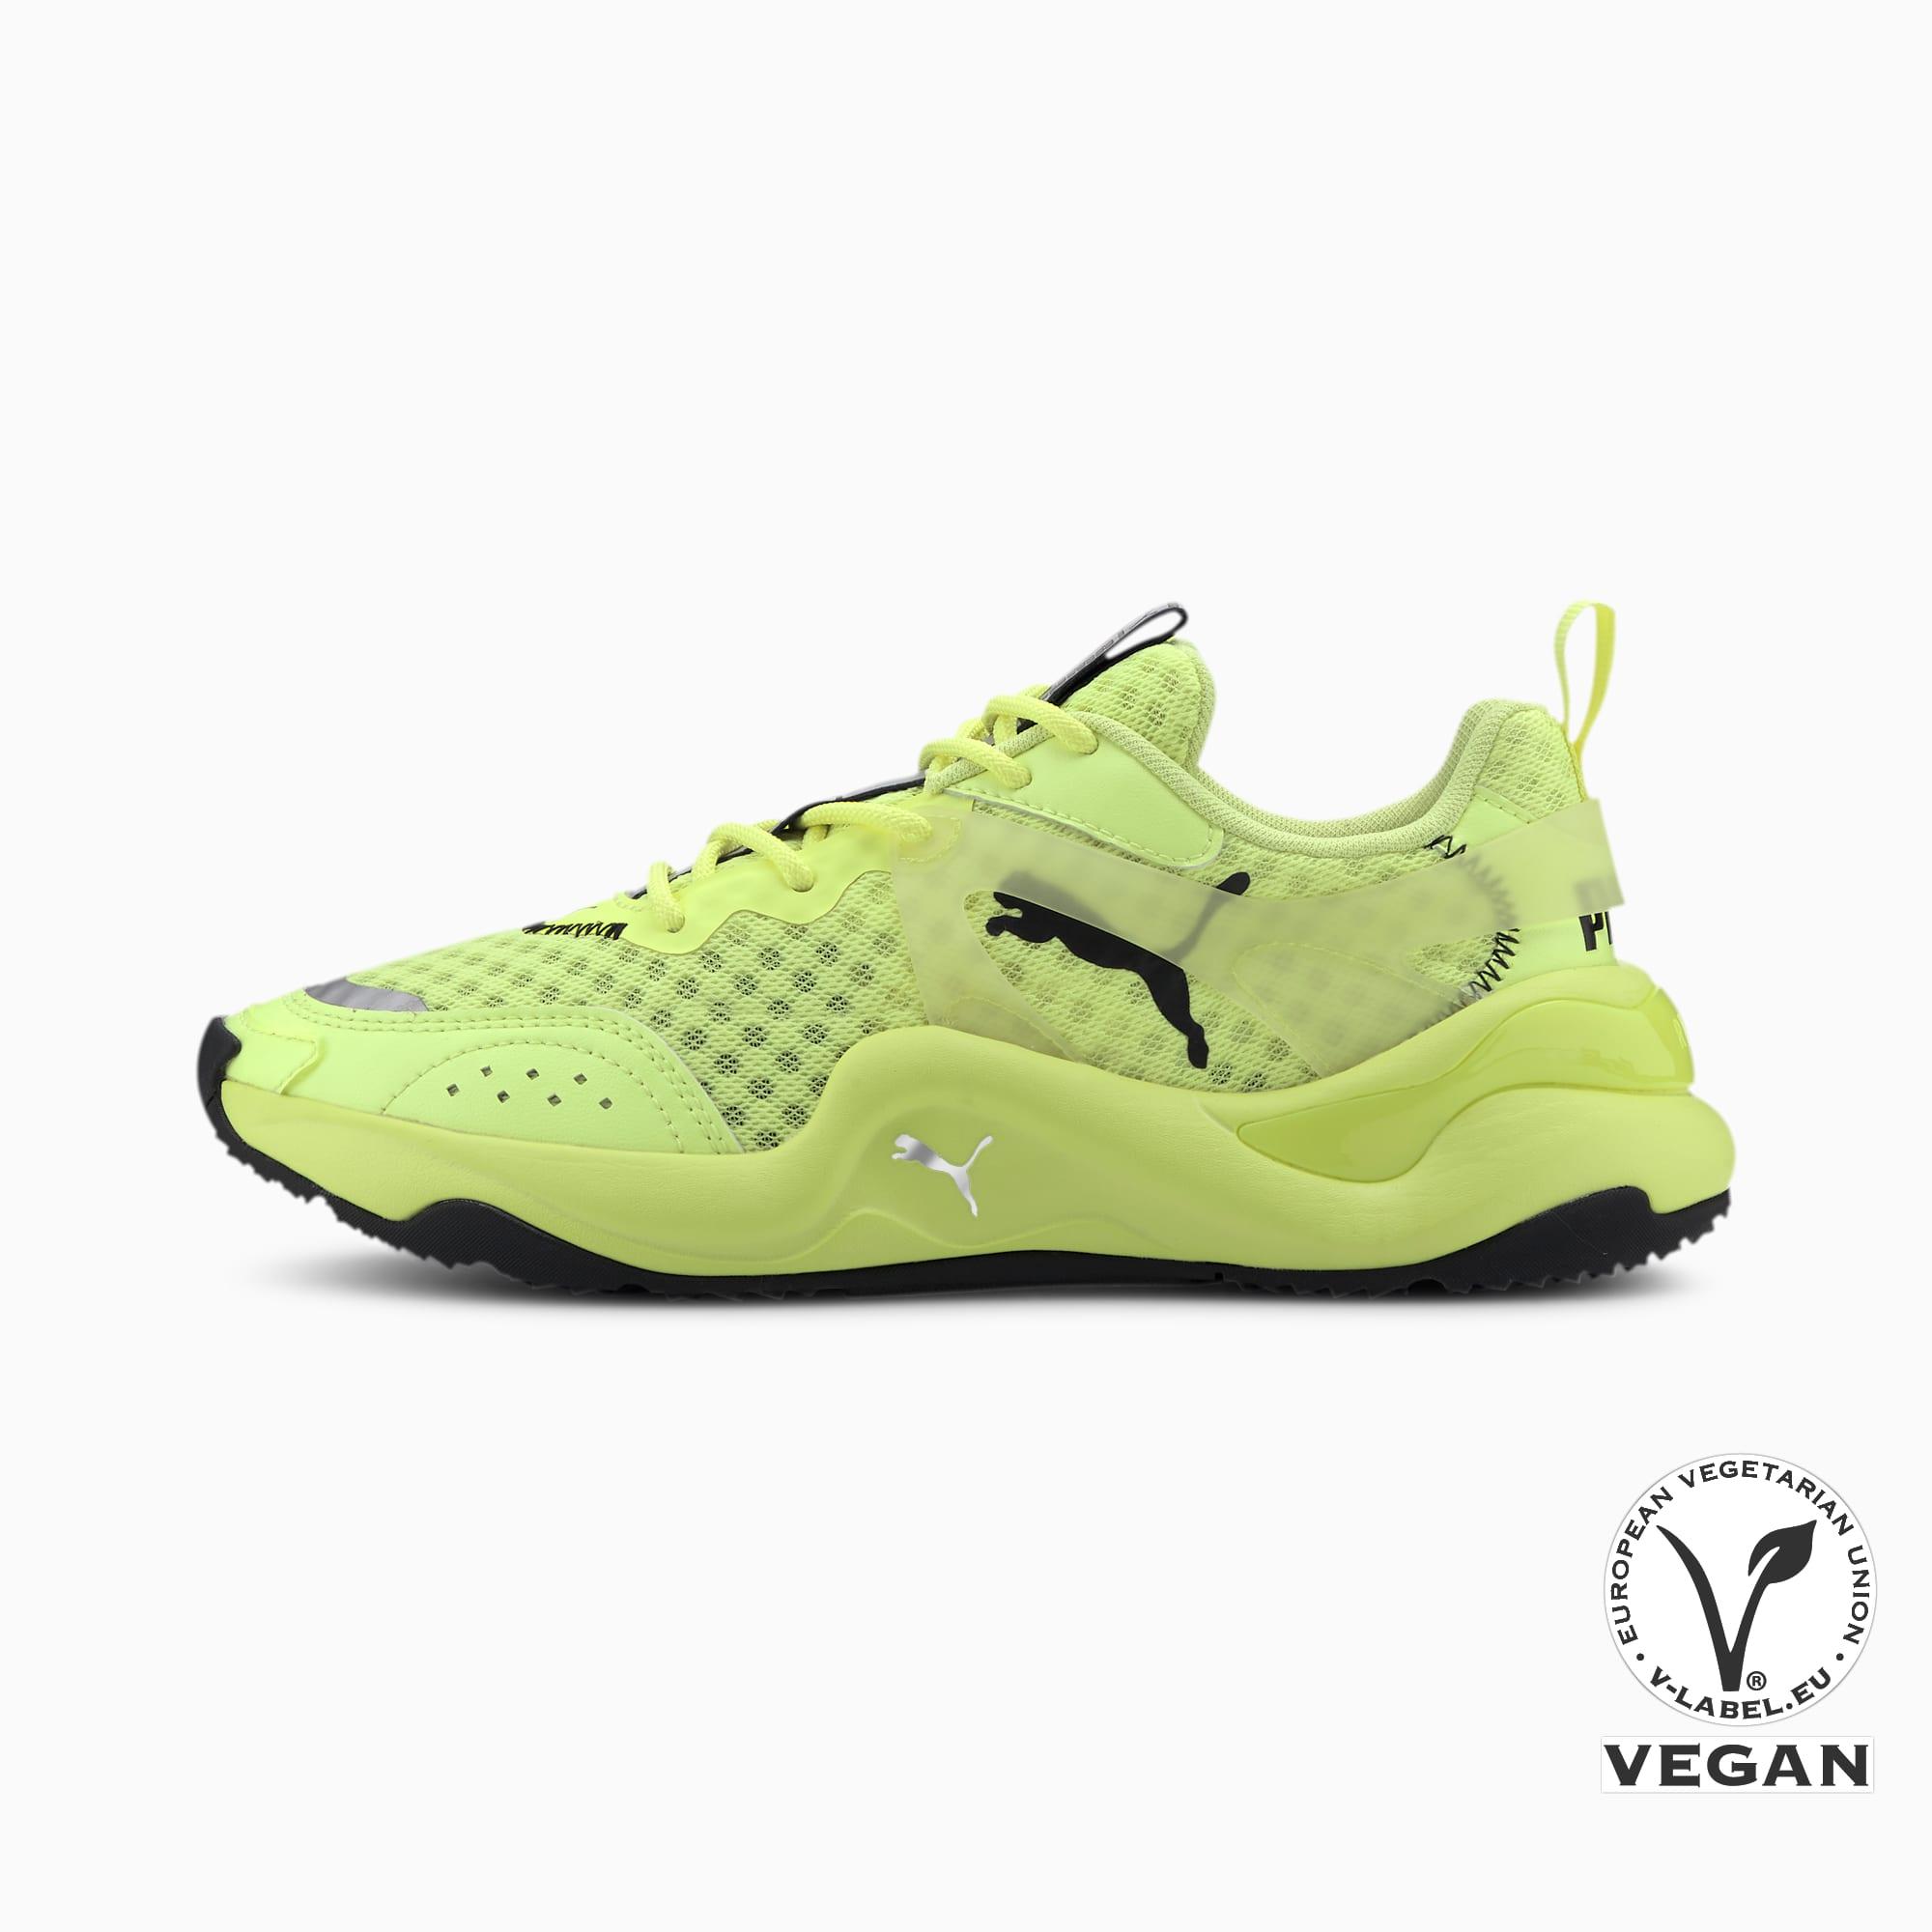 PUMA Chaussure Basket Rise Neon pour Femme, Jaune, Taille 38, Chaussures